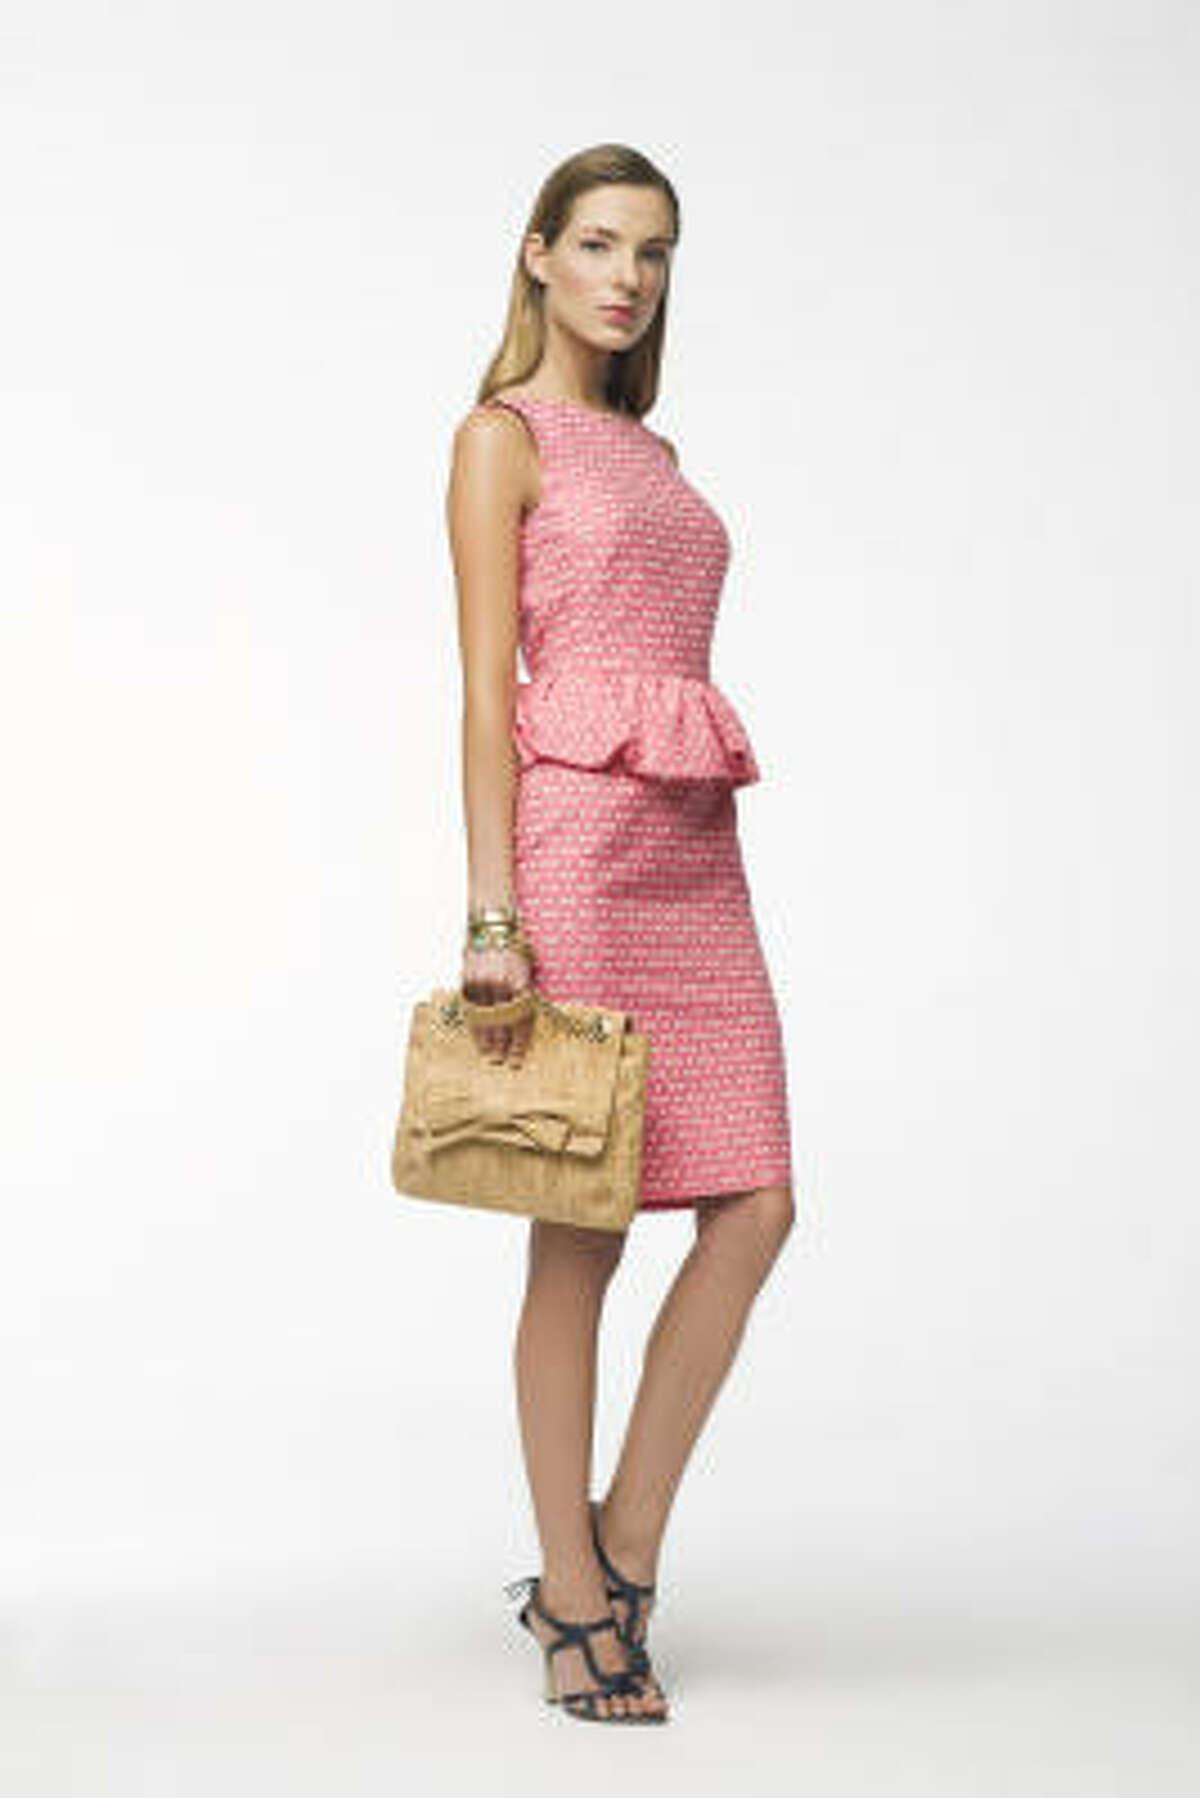 A pink print dress and accessories from CH Carolina Herrera.